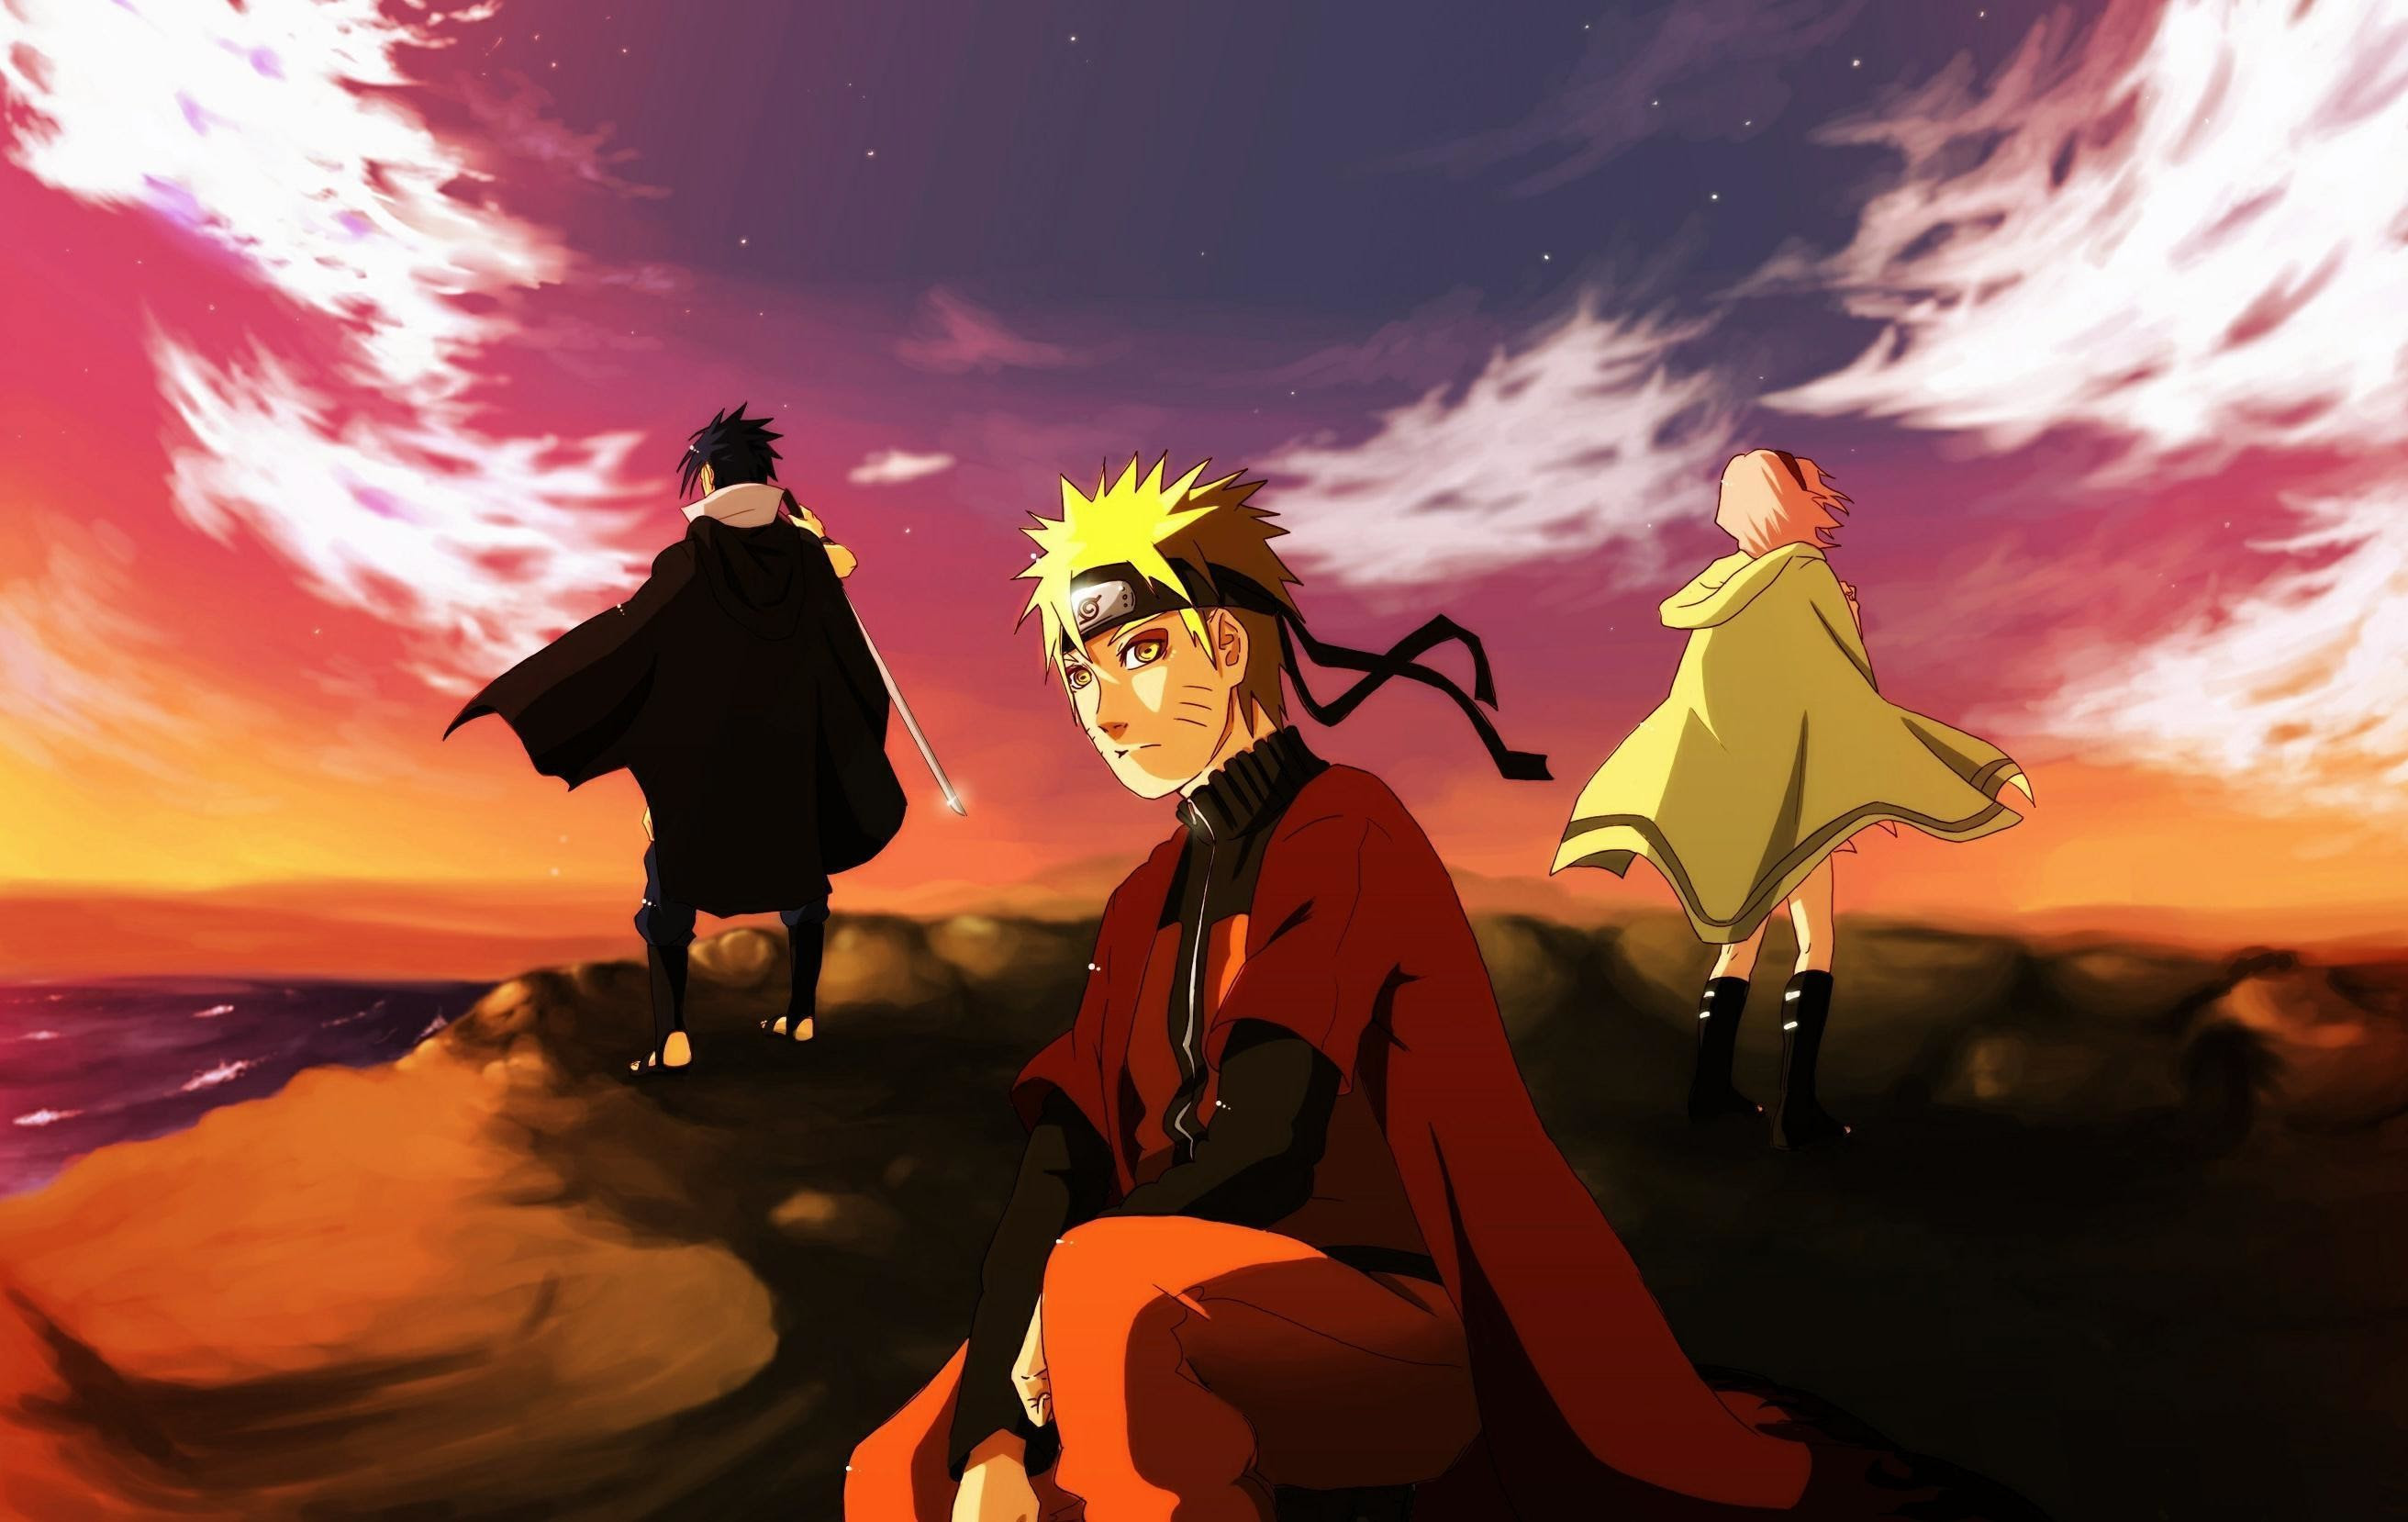 Unduh 52 Koleksi Wallpaper Naruto The Last Hd HD Gratid